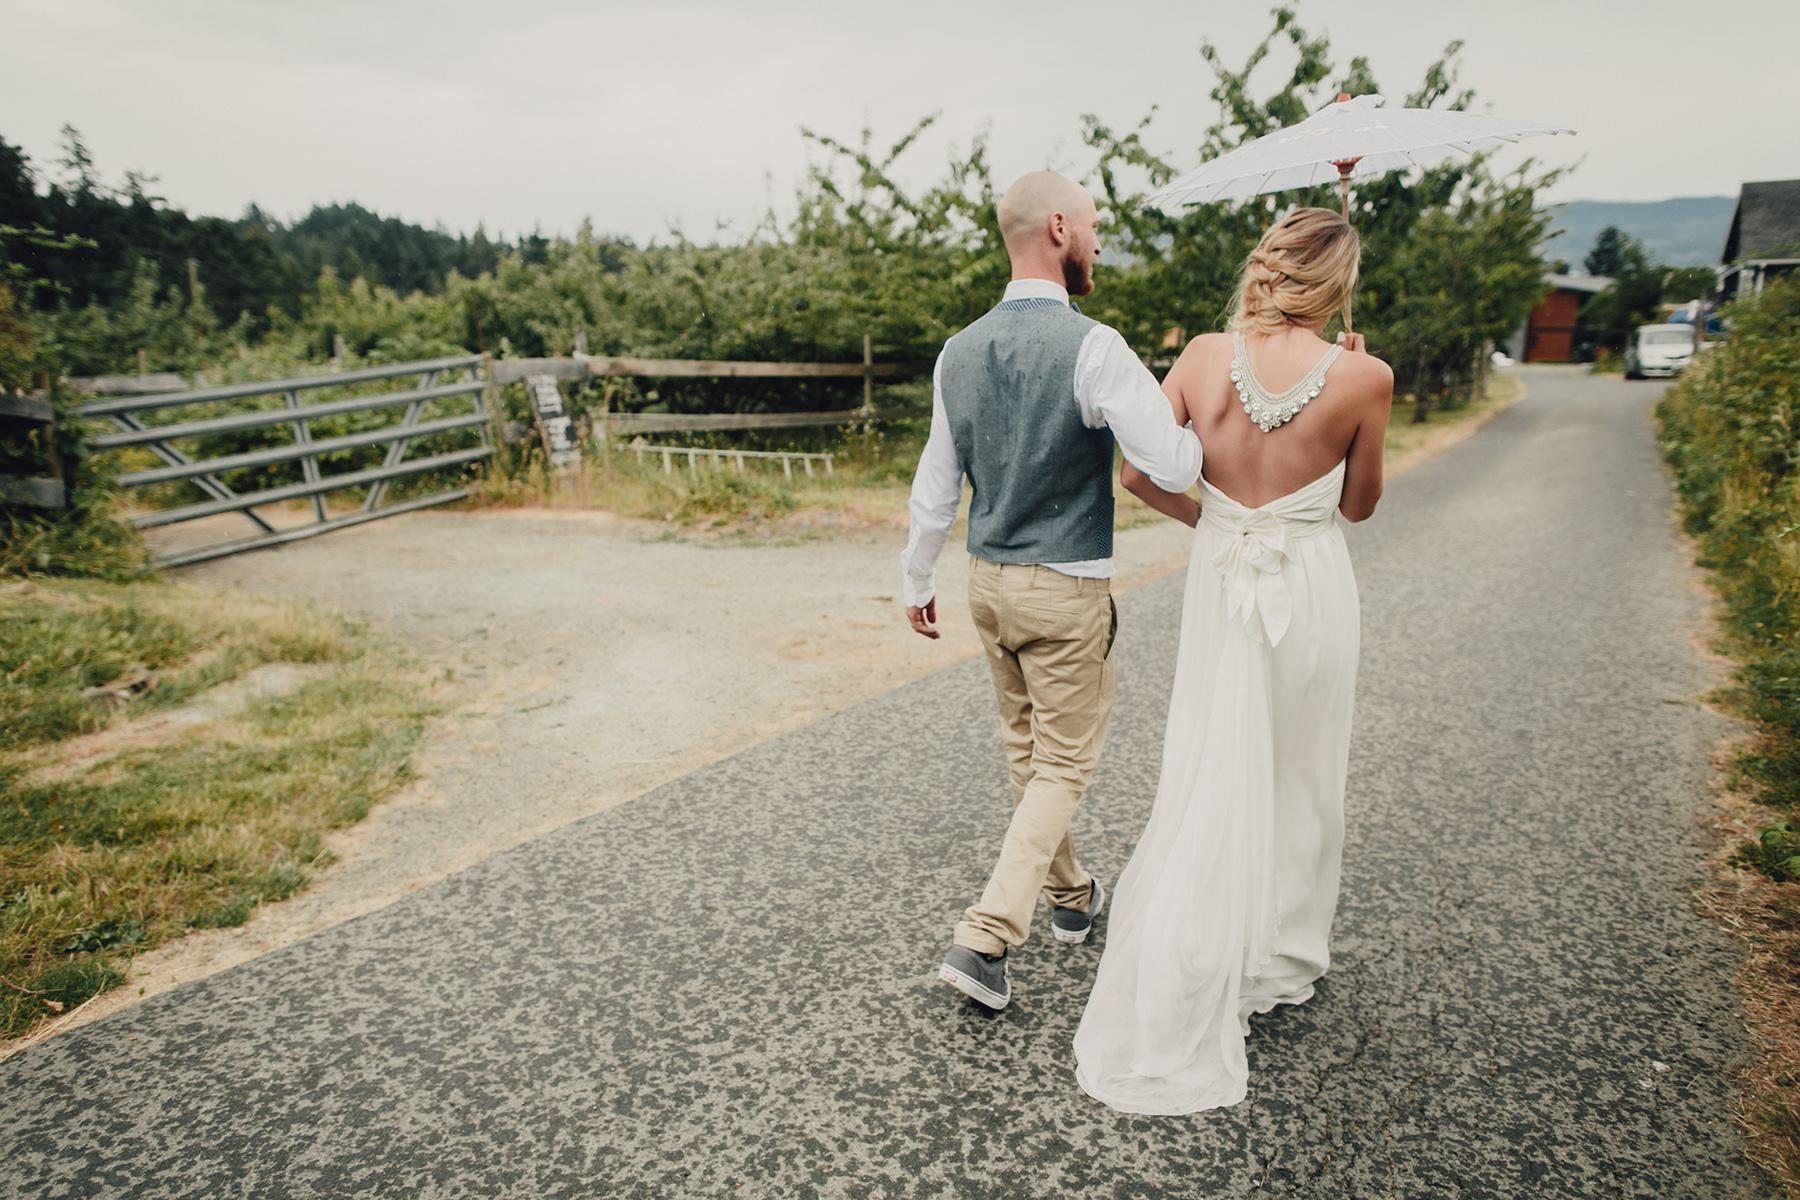 kildara-farms-wedding-photo-inspiration-0063